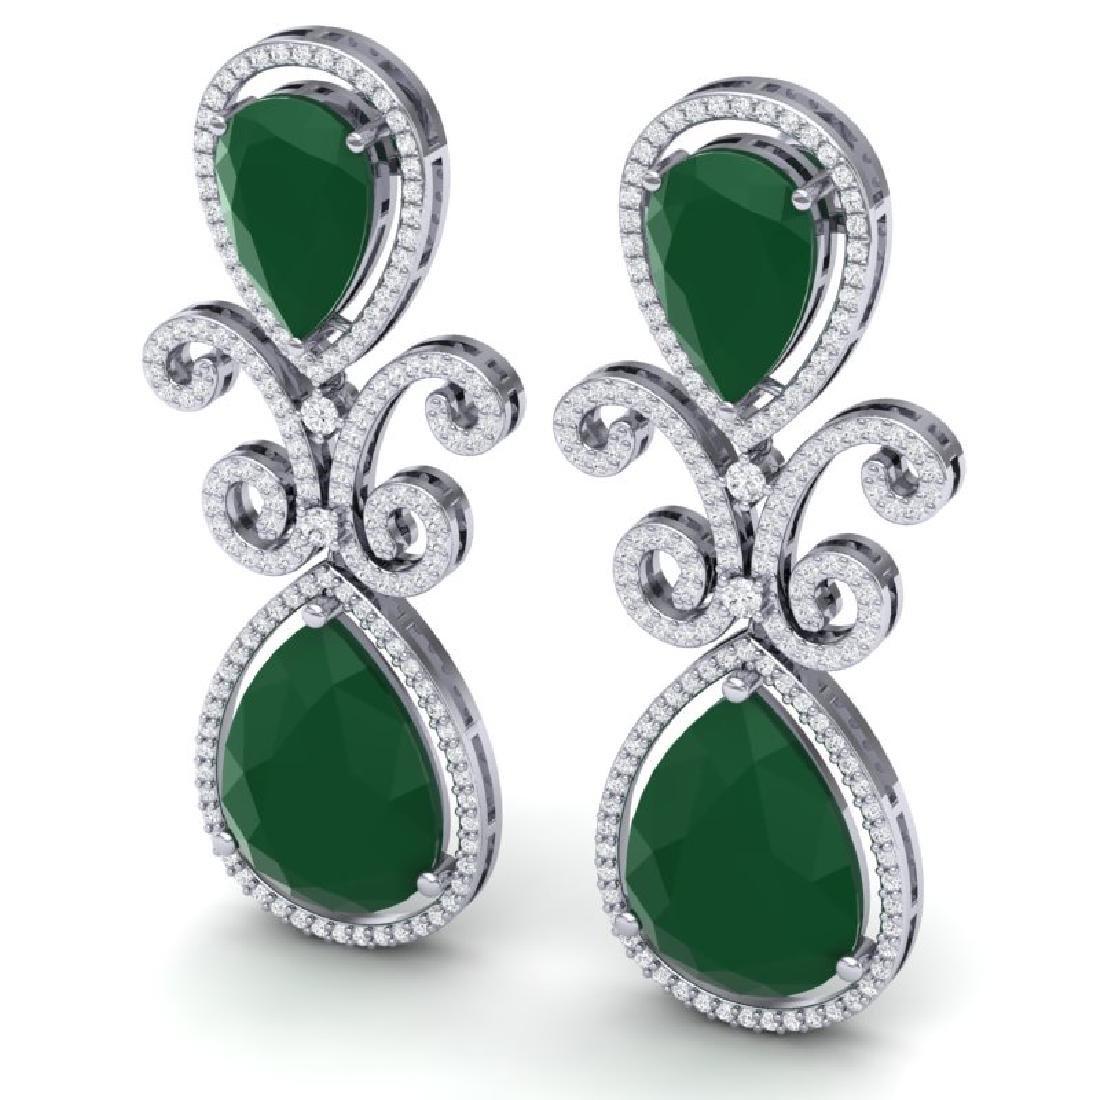 31.6 CTW Royalty Emerald & VS Diamond Earrings 18K - 2